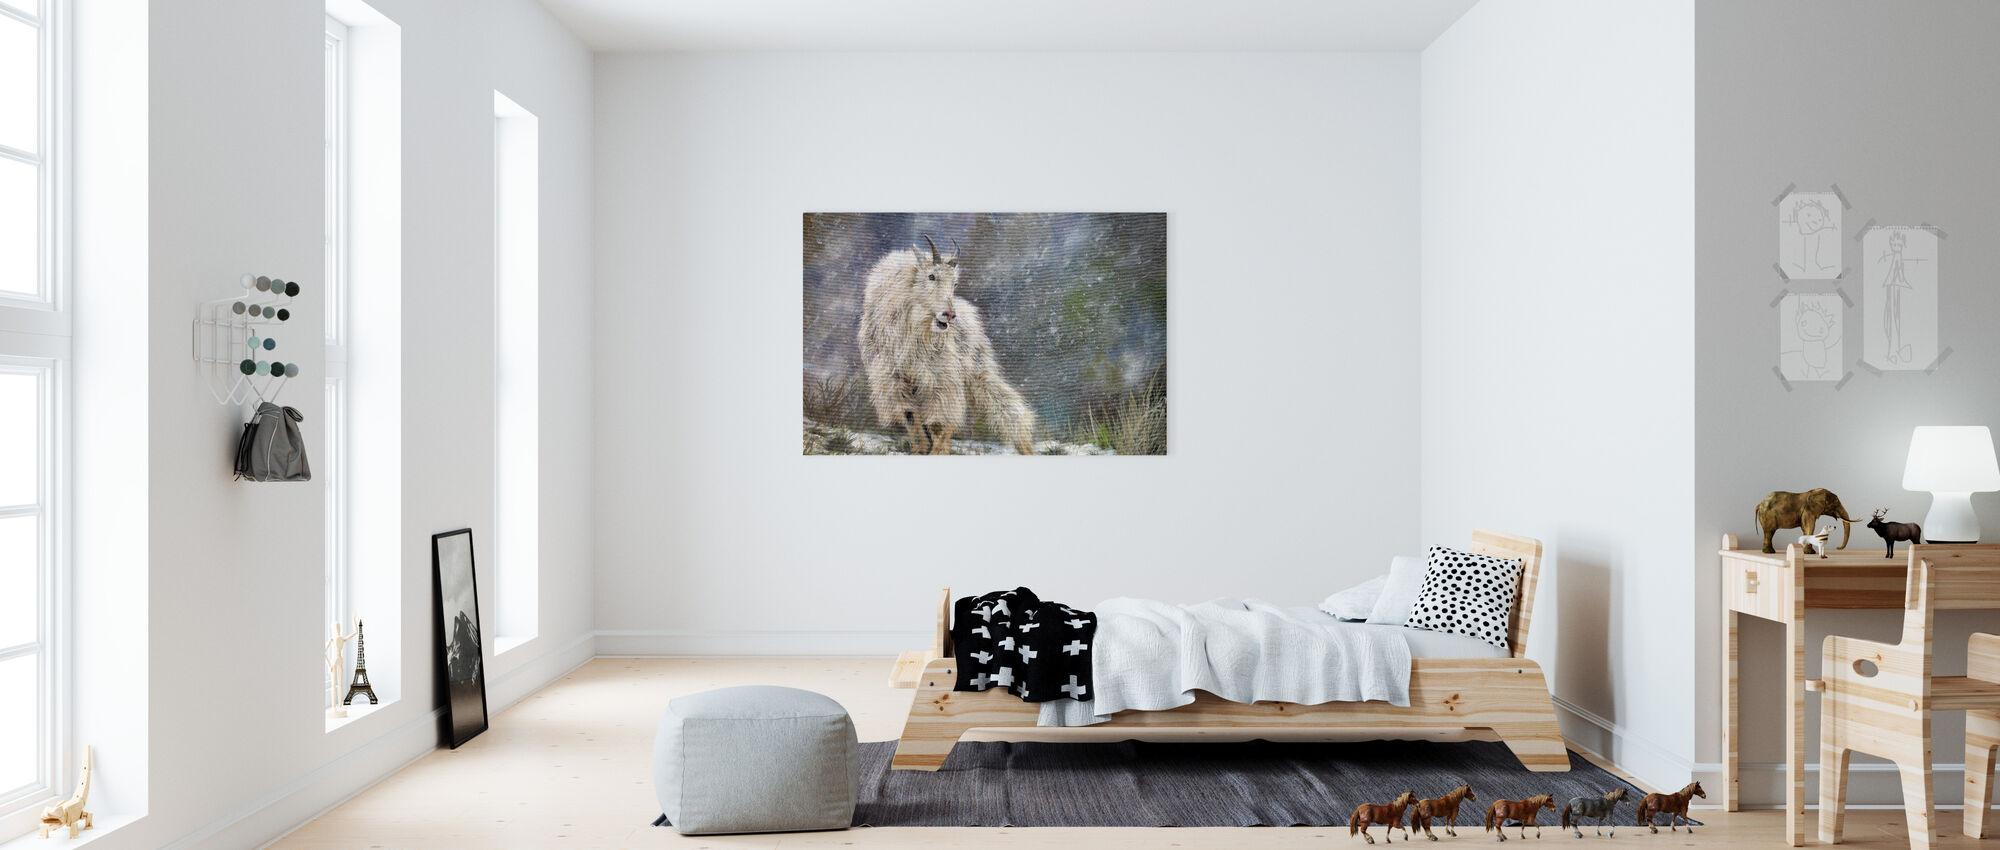 Wild Mountain Goat - Canvas print - Kids Room